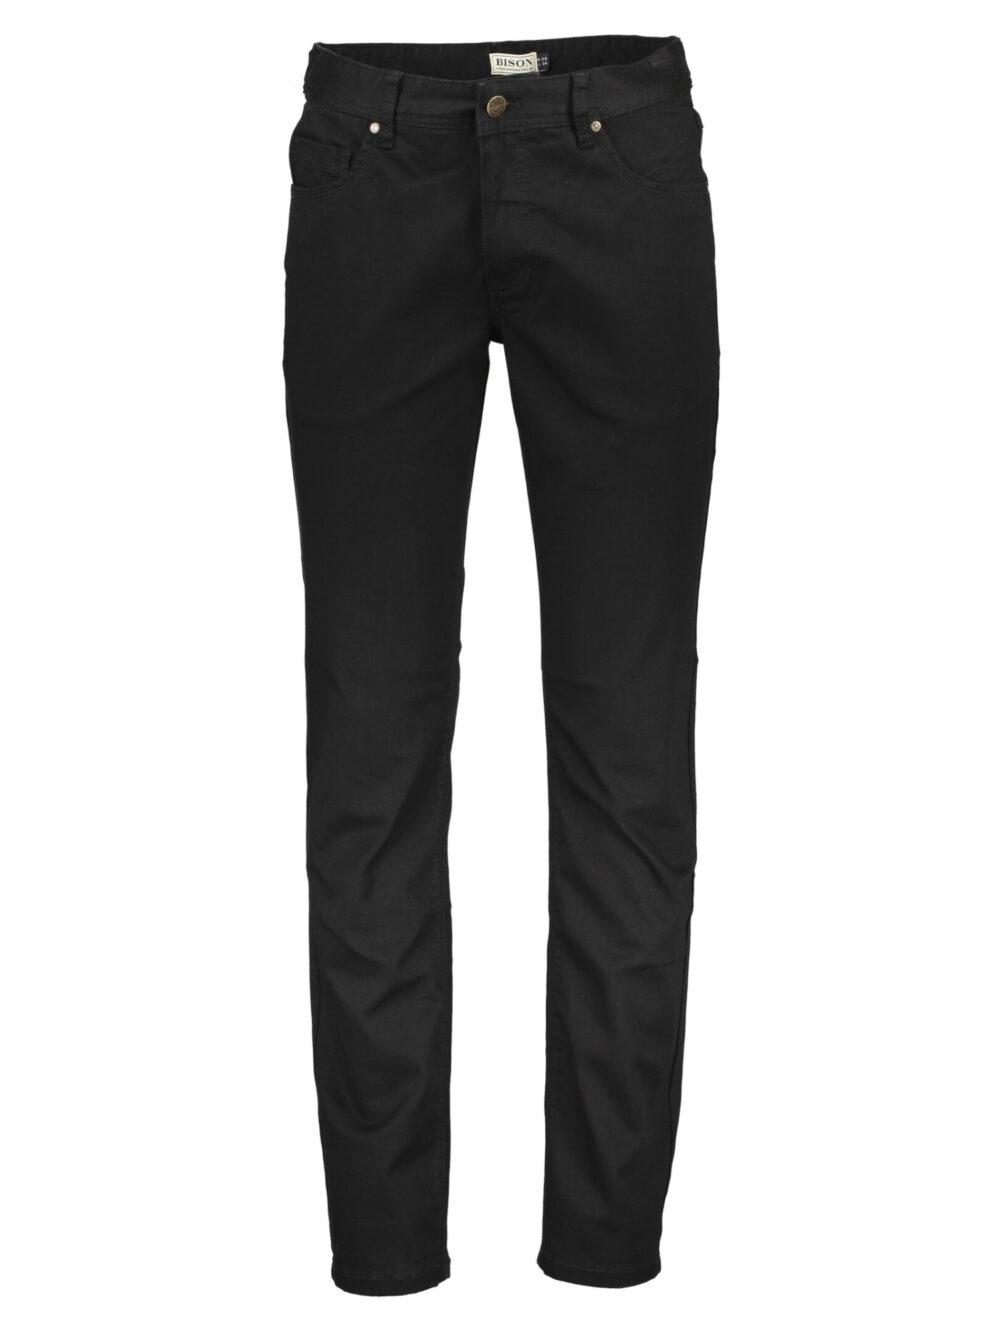 Bison Jeans Superflex Black